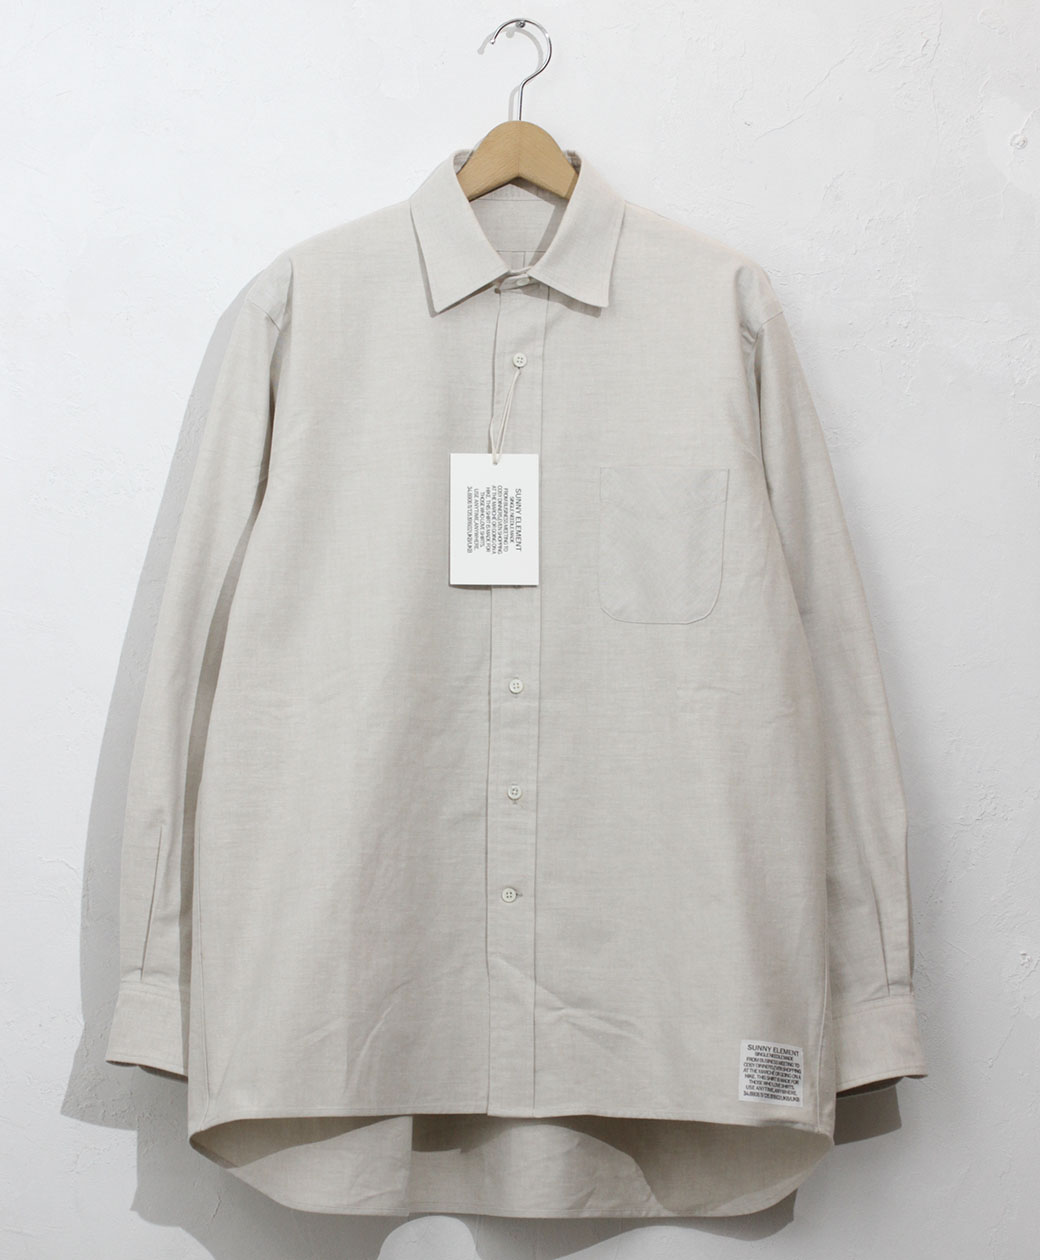 SUNNY ELEMENT Sleeping Shirt(Beige)